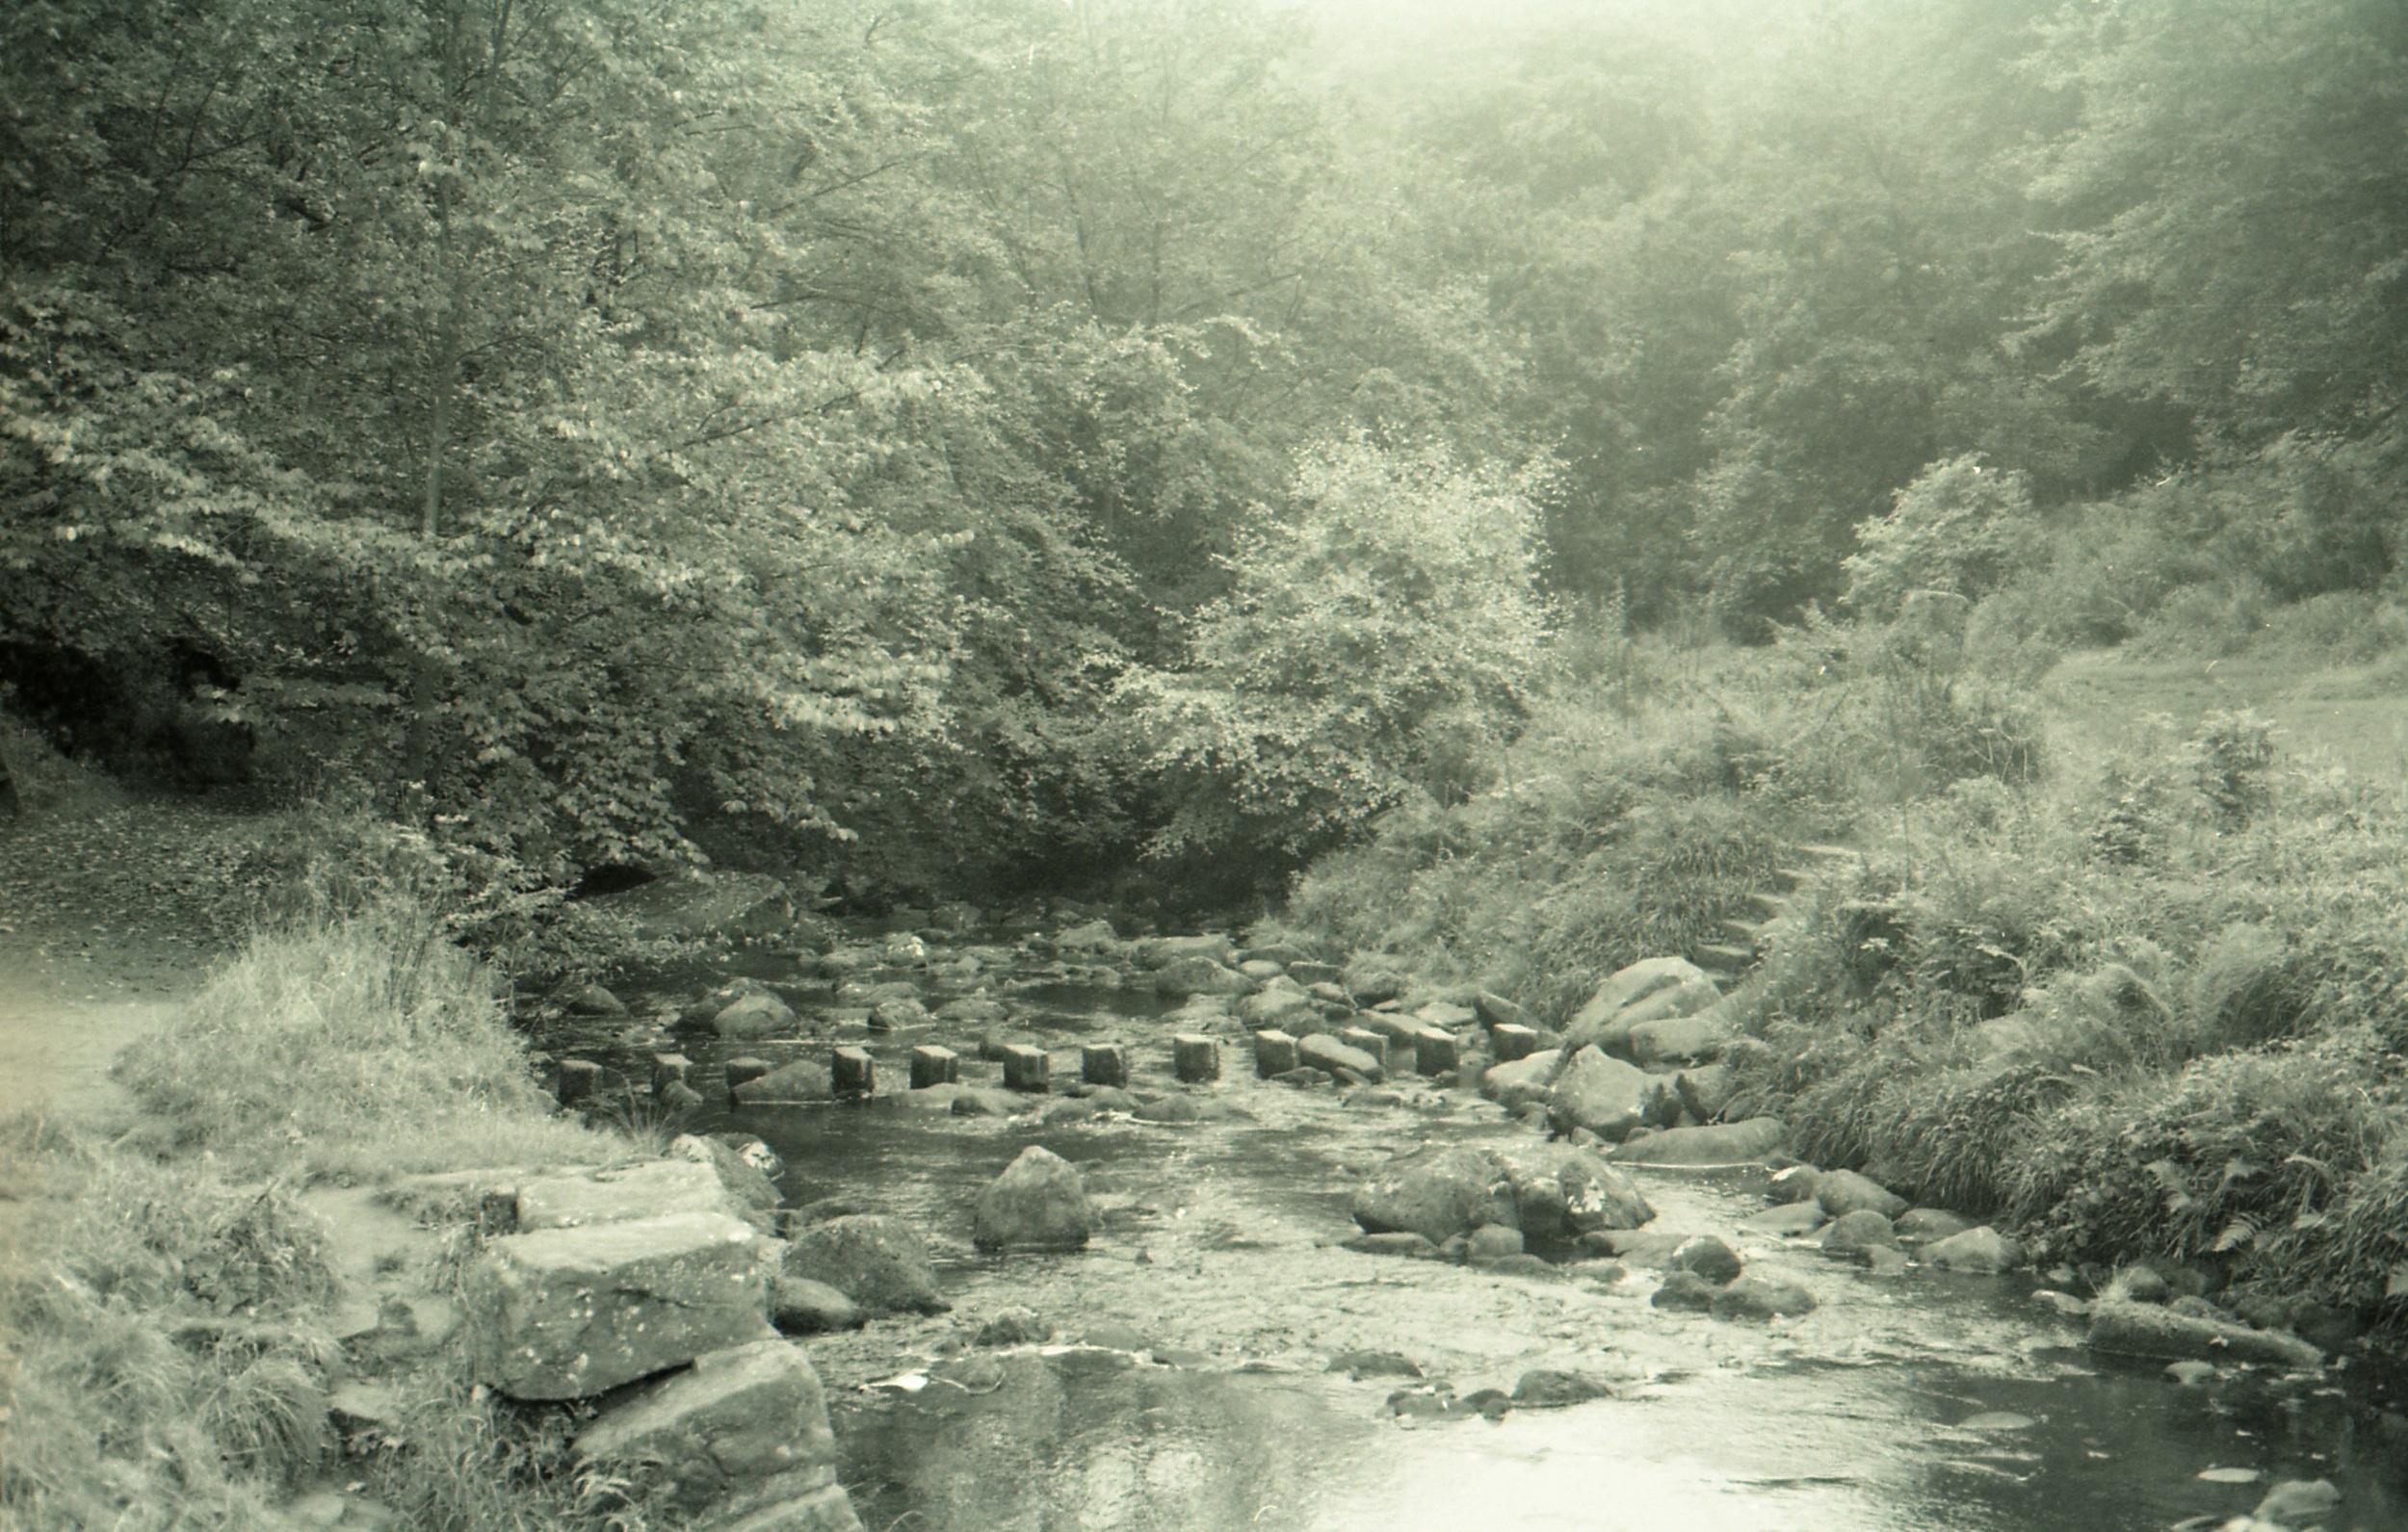 (Camera: Canon EOS 750 Film: Kodak BW400CN Location: Hardcastle Craggs, Hebden Bridge)